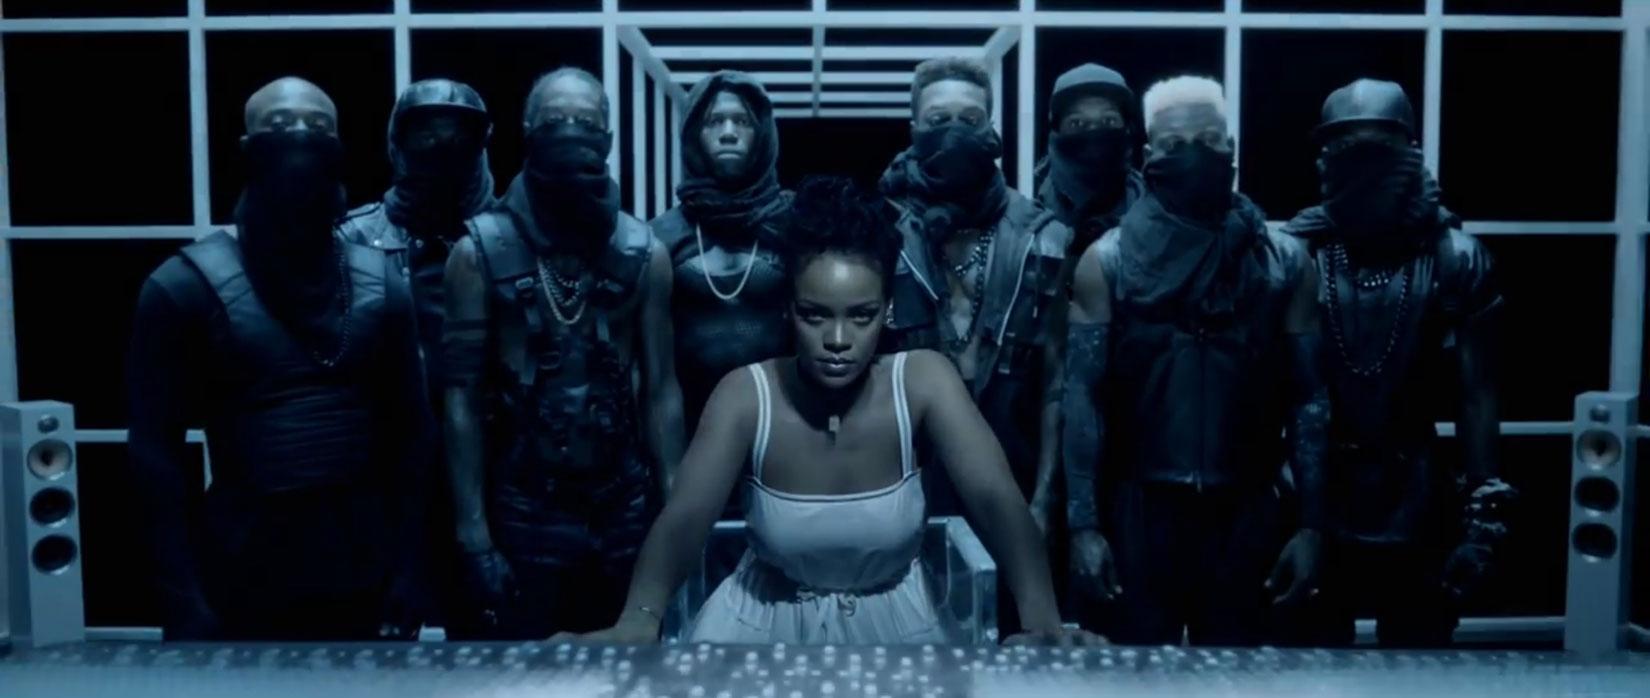 Rihanna_ANTI_diaRy_4